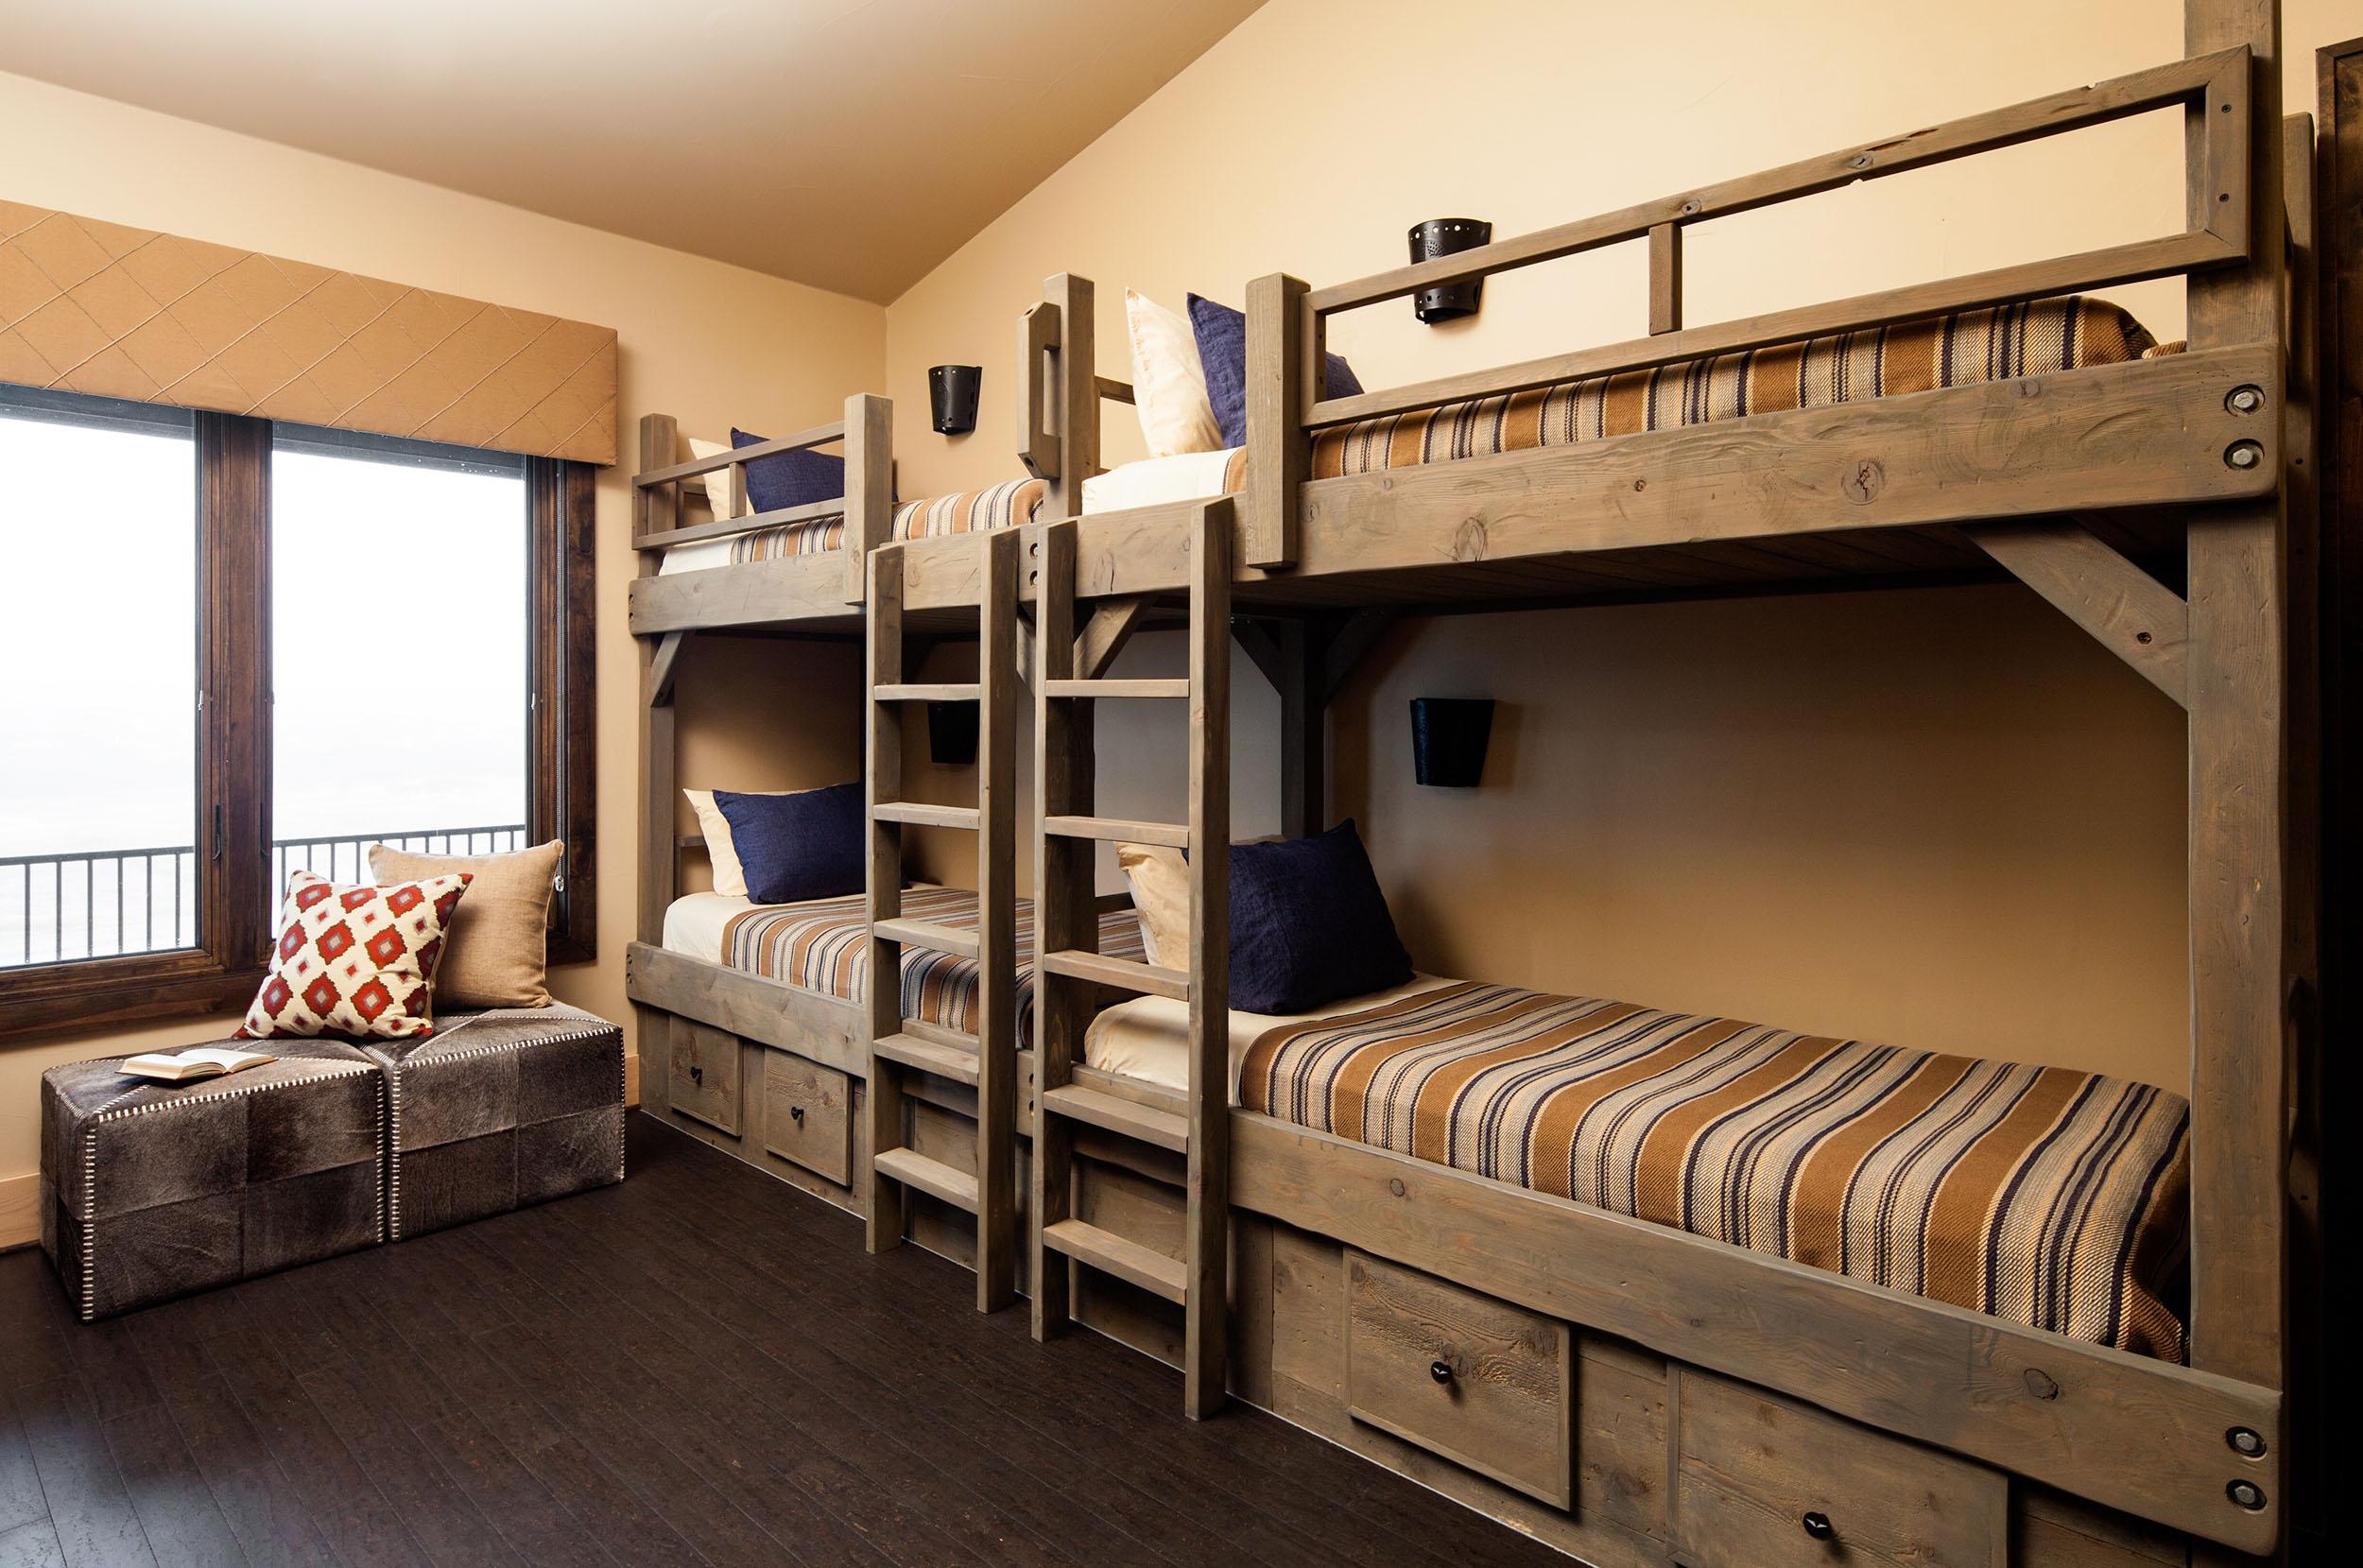 austin-house-bedroom-bunk-bed-interior-design.jpg